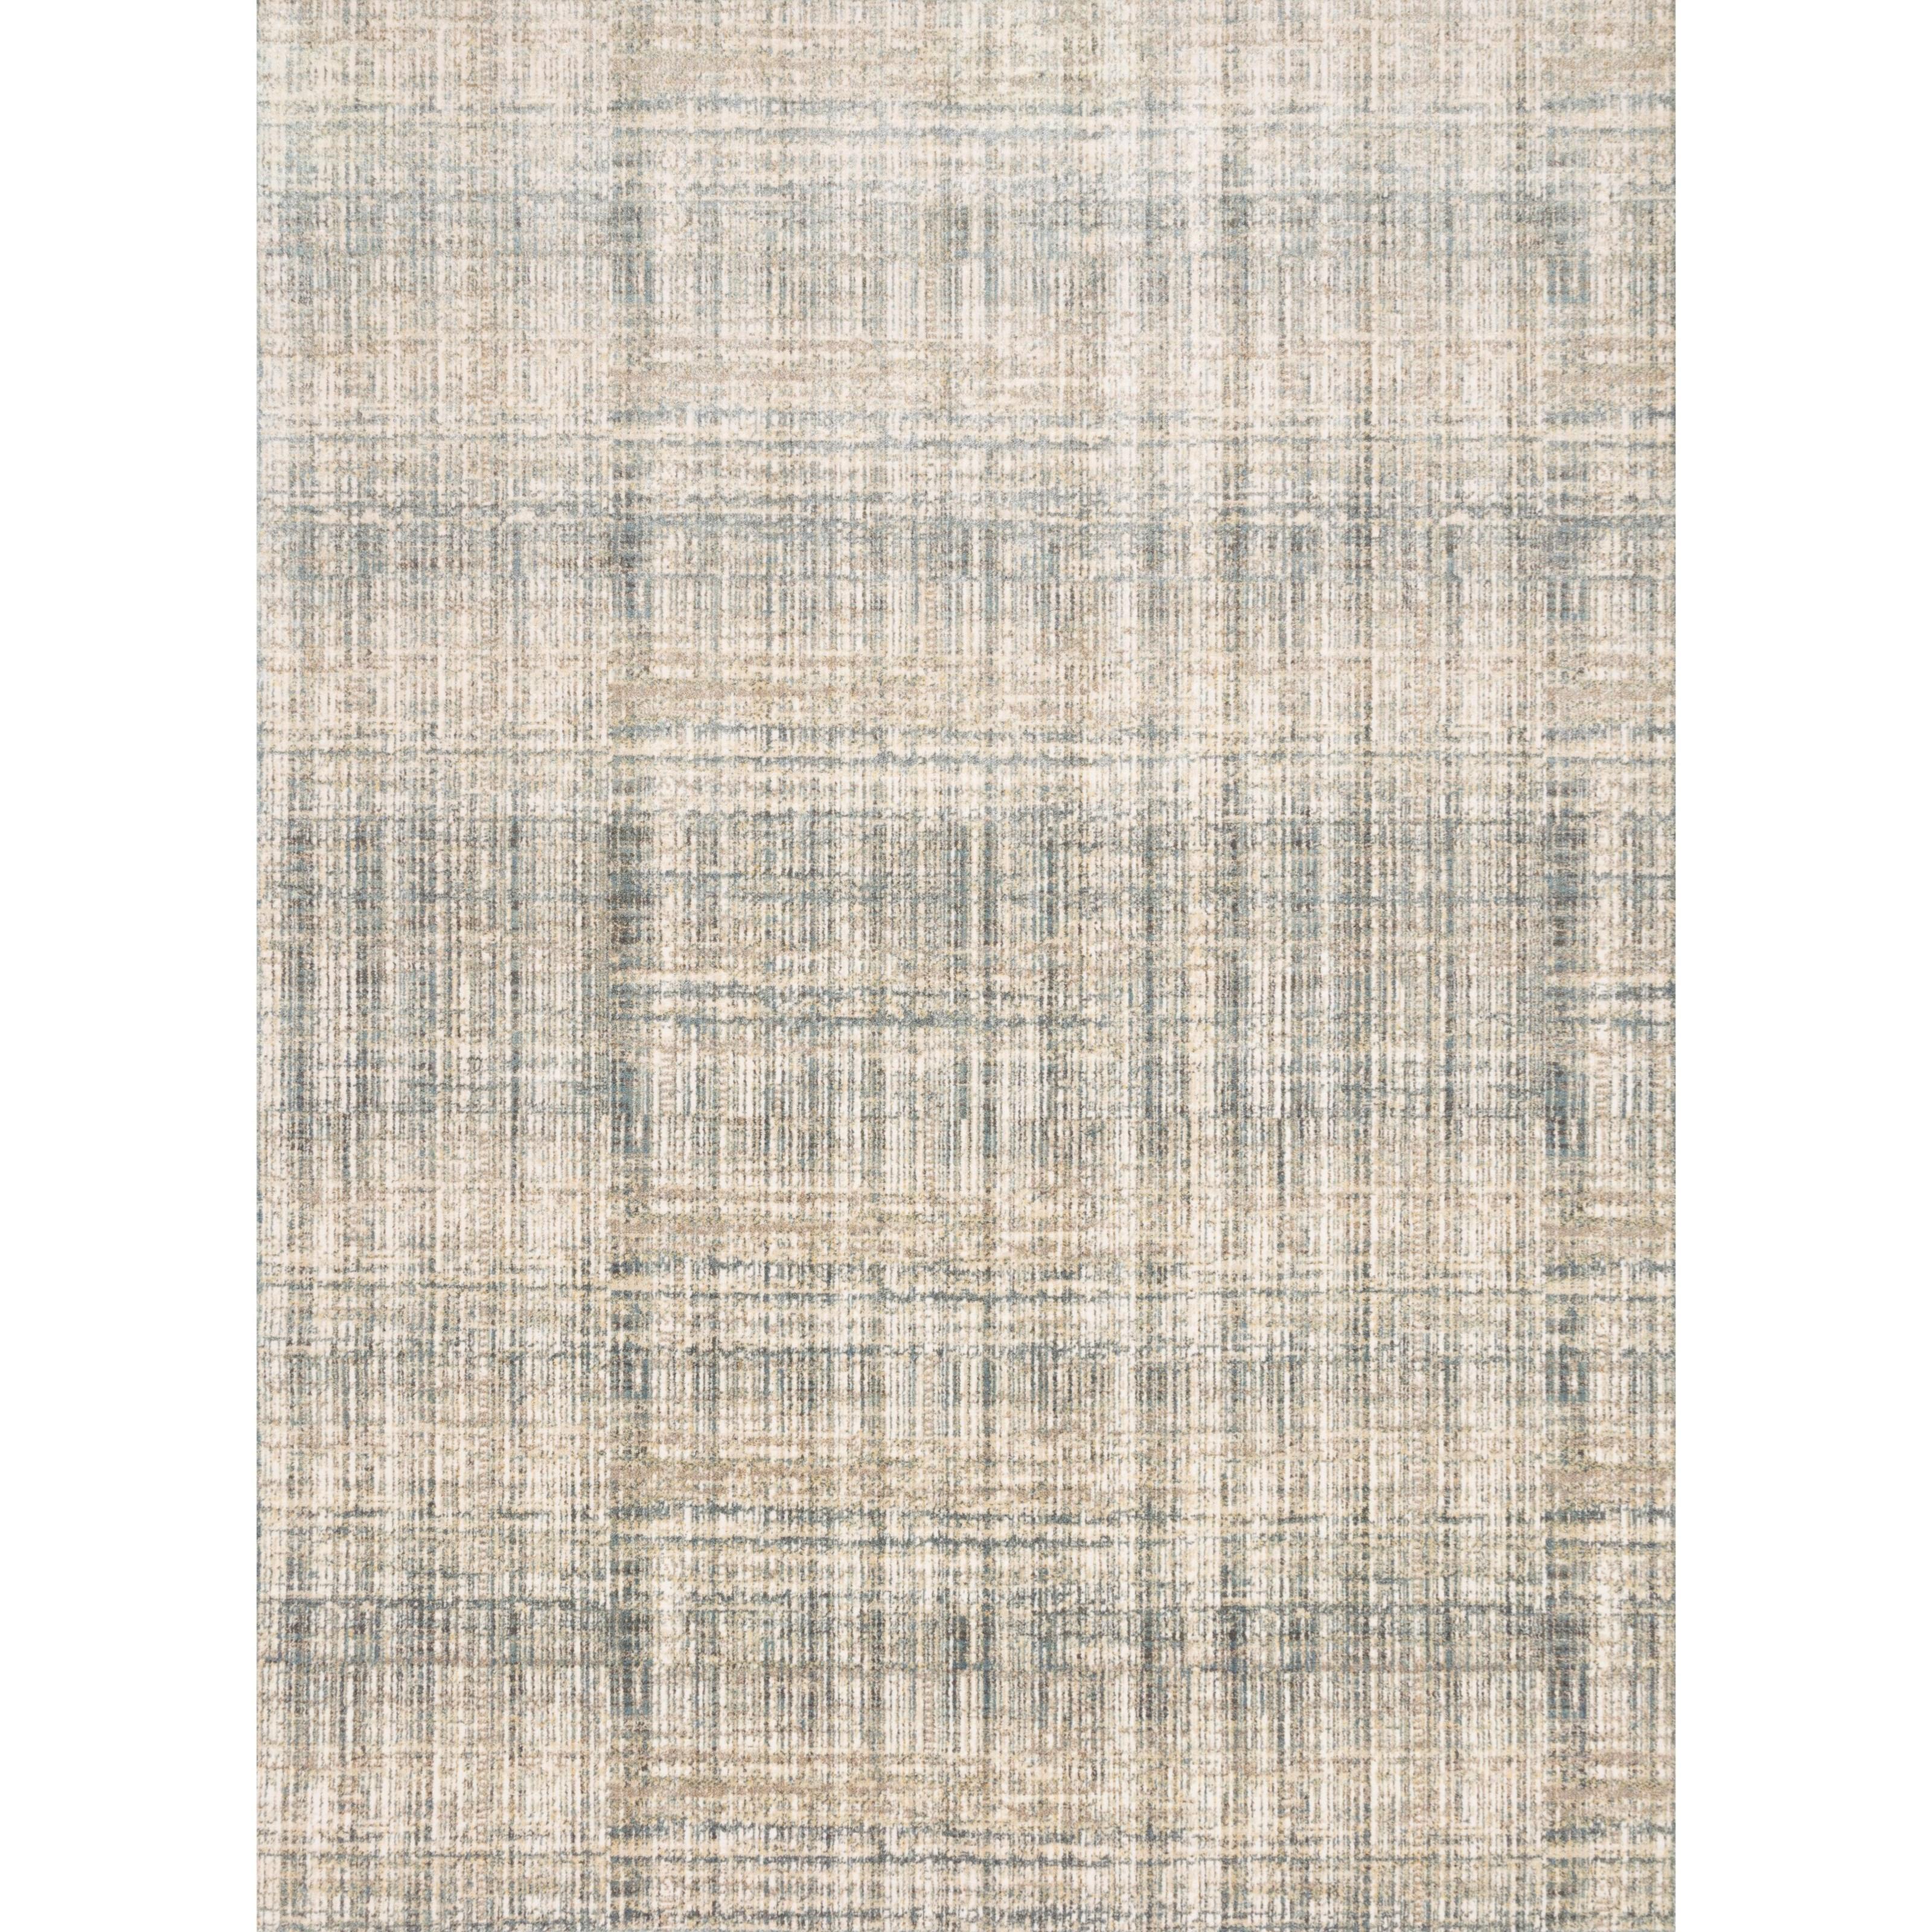 "Reid 2'7"" x 4' Bluestone Rug by Loloi Rugs at Virginia Furniture Market"